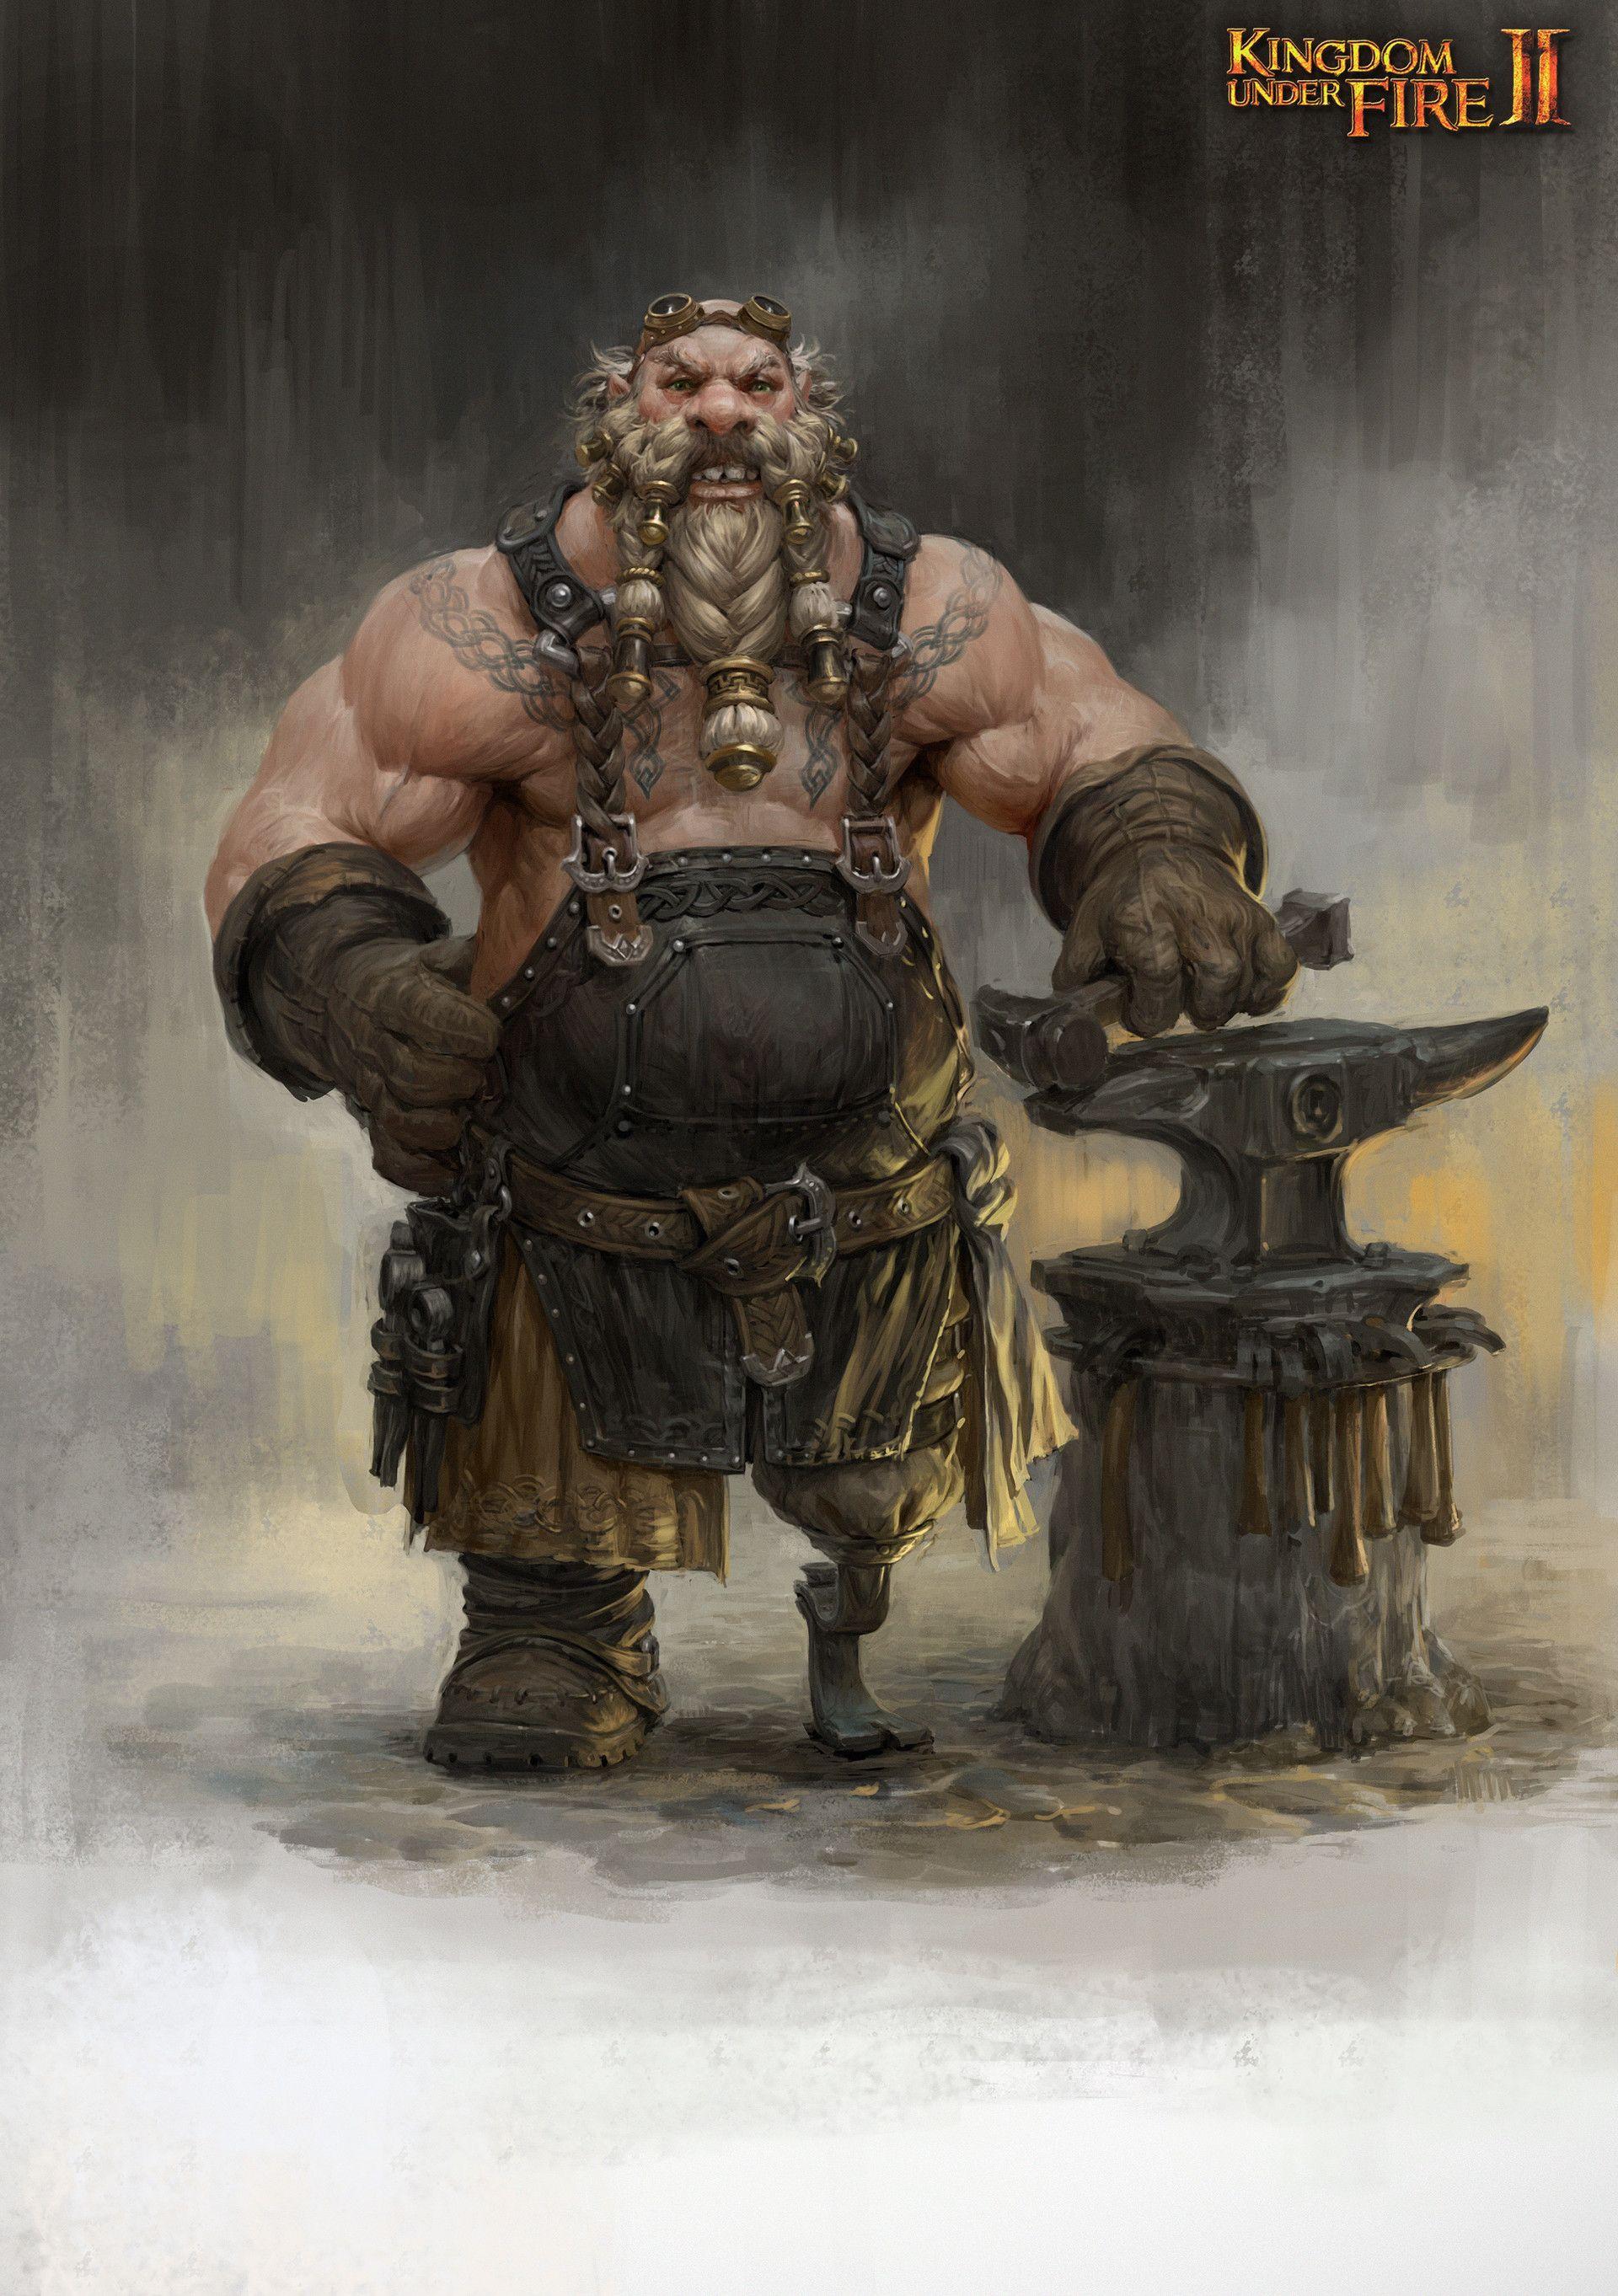 ArtStation - kingdom under fire2 dwarf concept , Sungryun Park | Fantasy  dwarf, Fantasy character design, Dnd dwarf